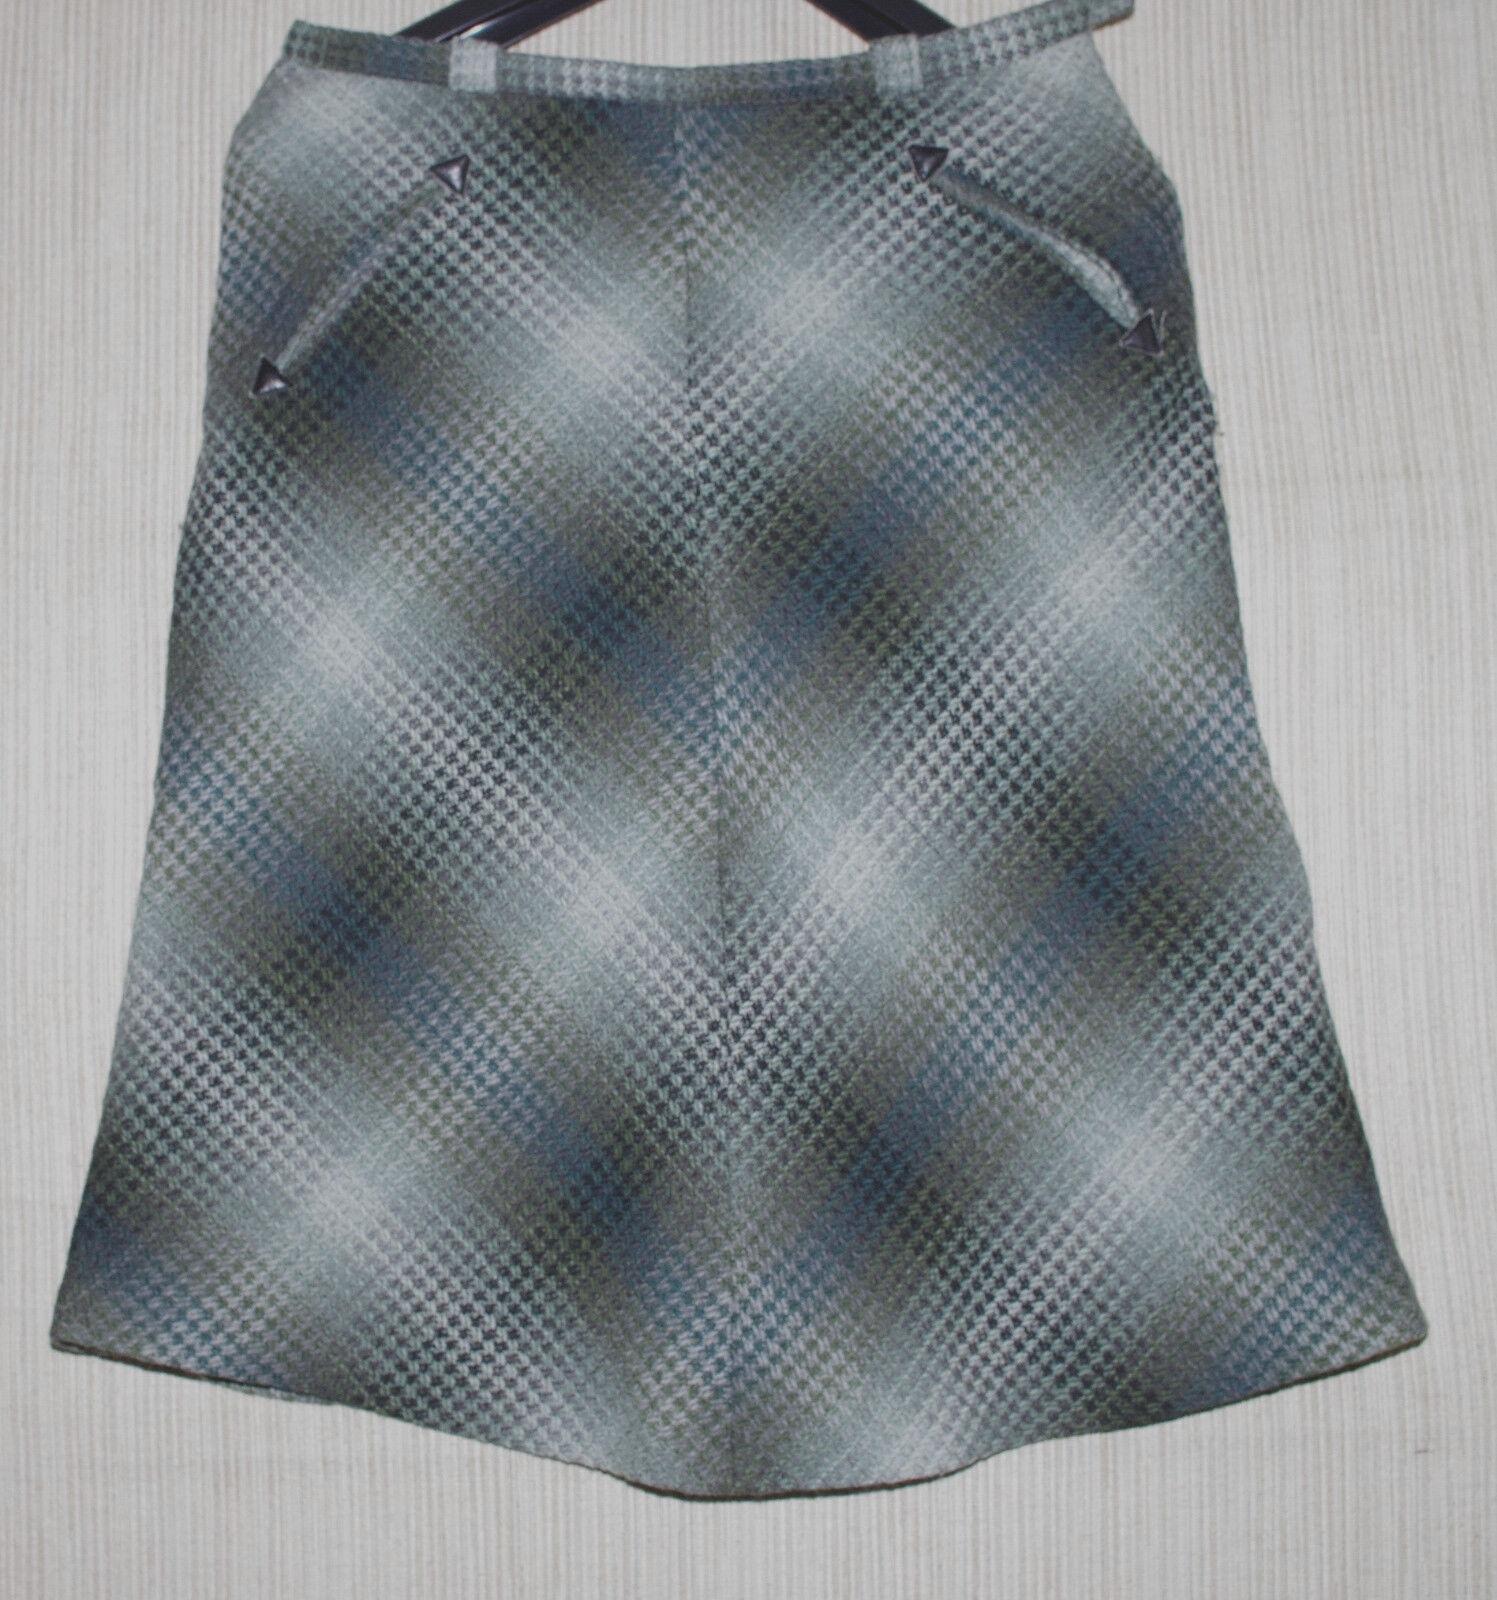 Paul & Joe Green Multi color A-line Knee-length Skirt Size  42